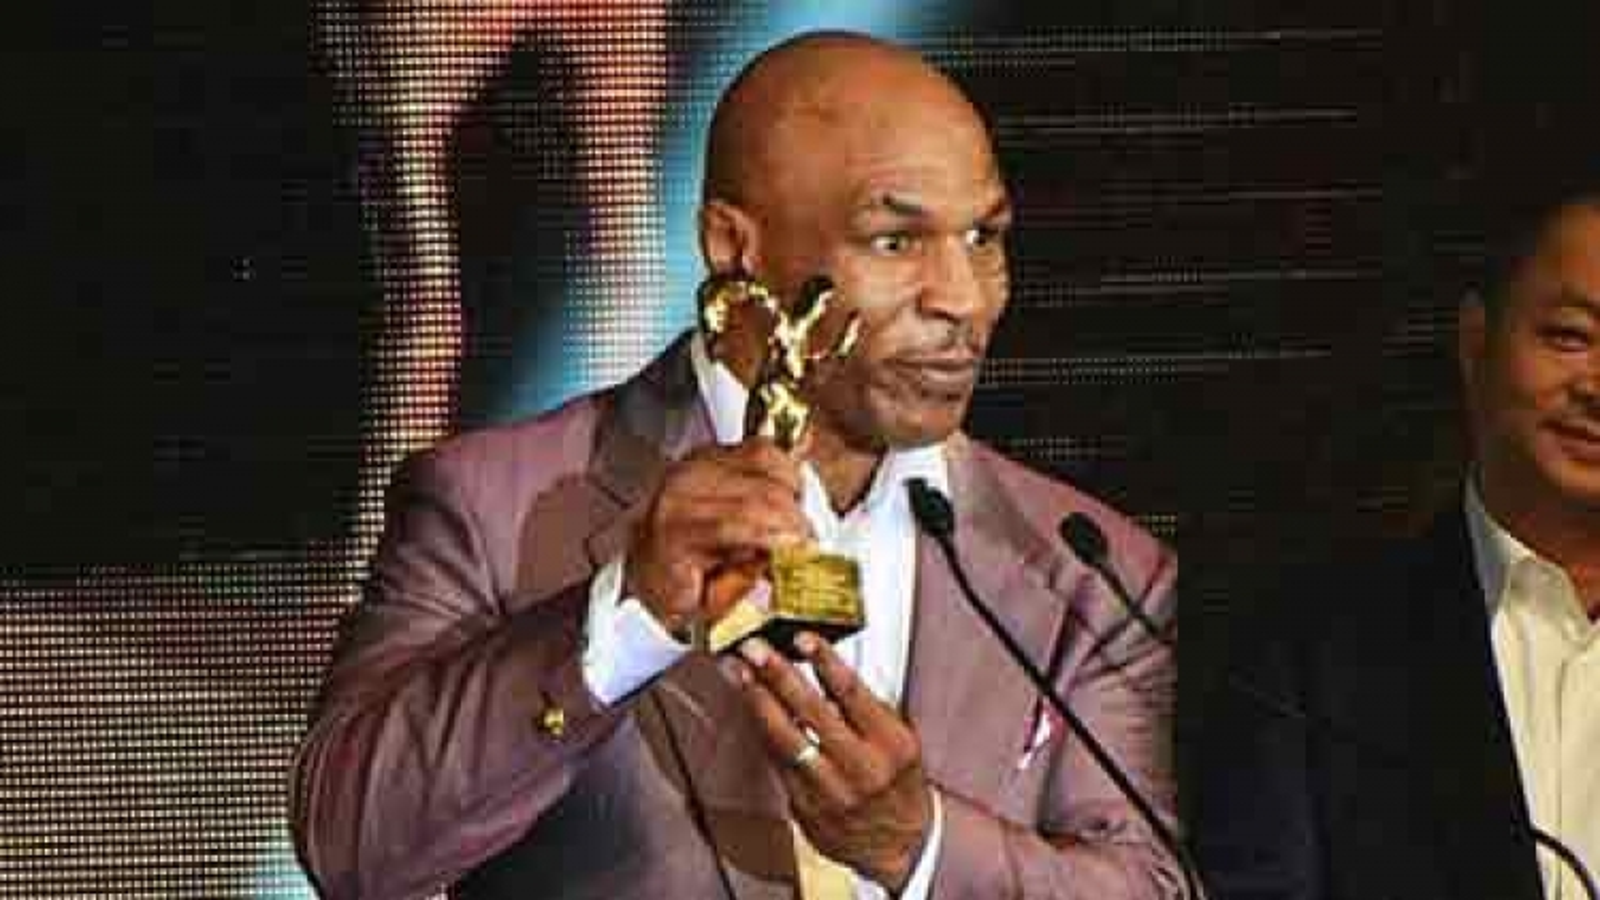 Mike Tyson to make film in Vietnam